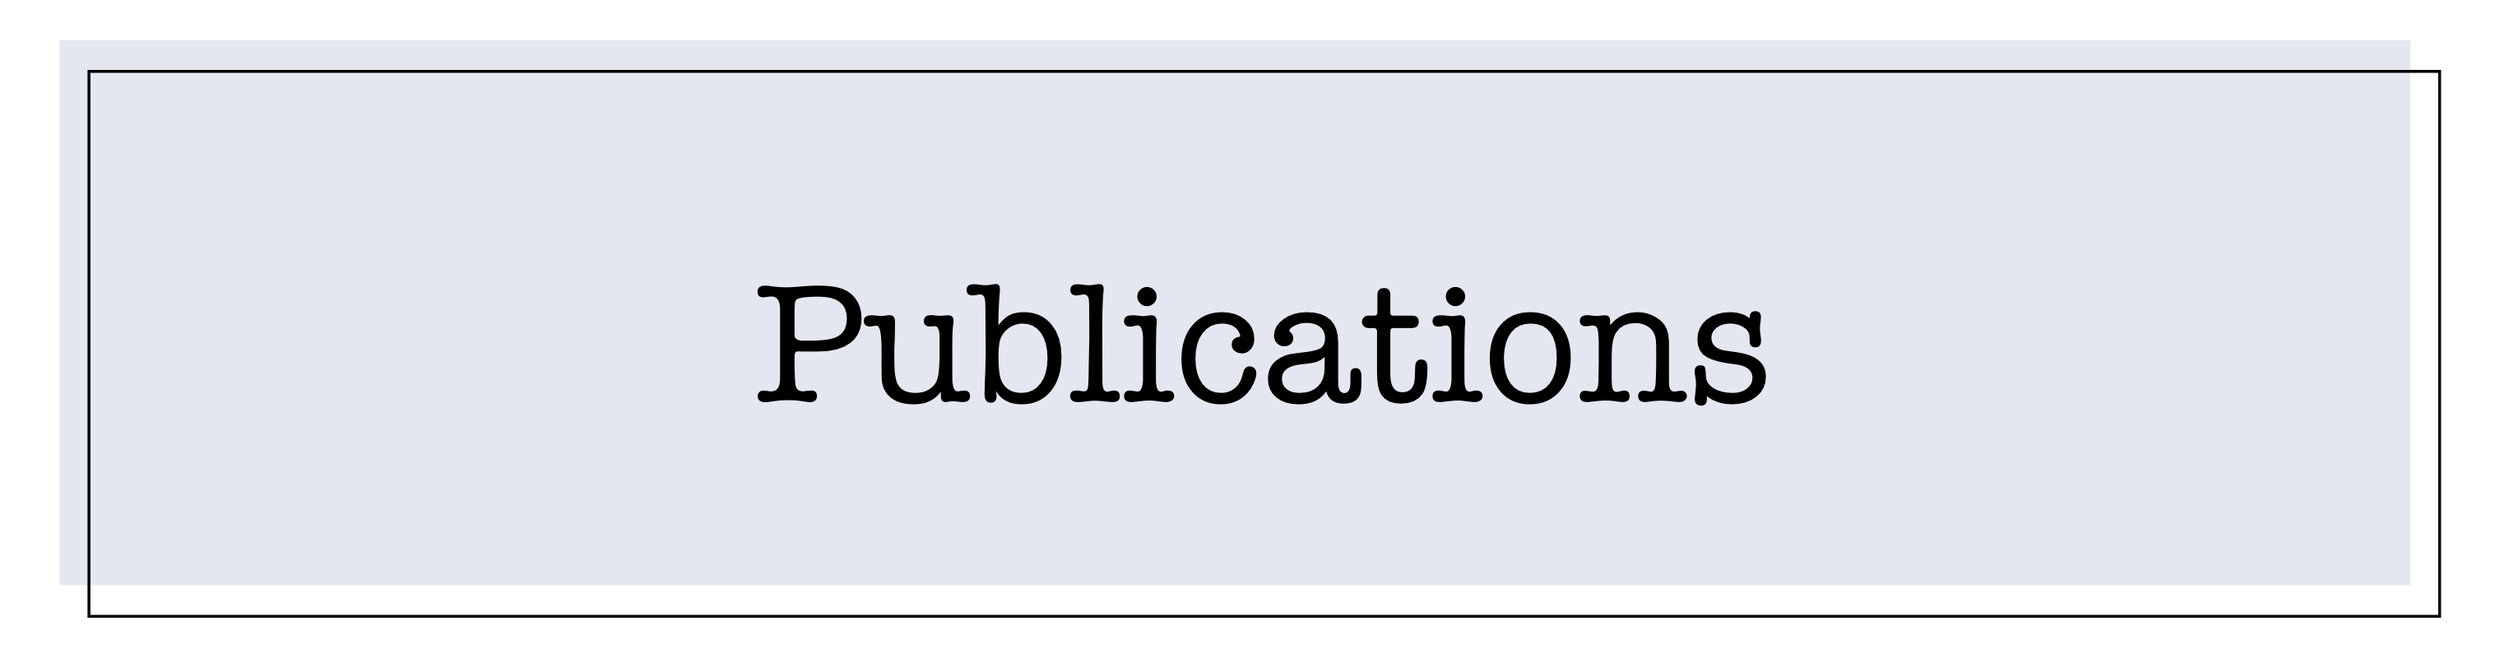 Publications .jpg